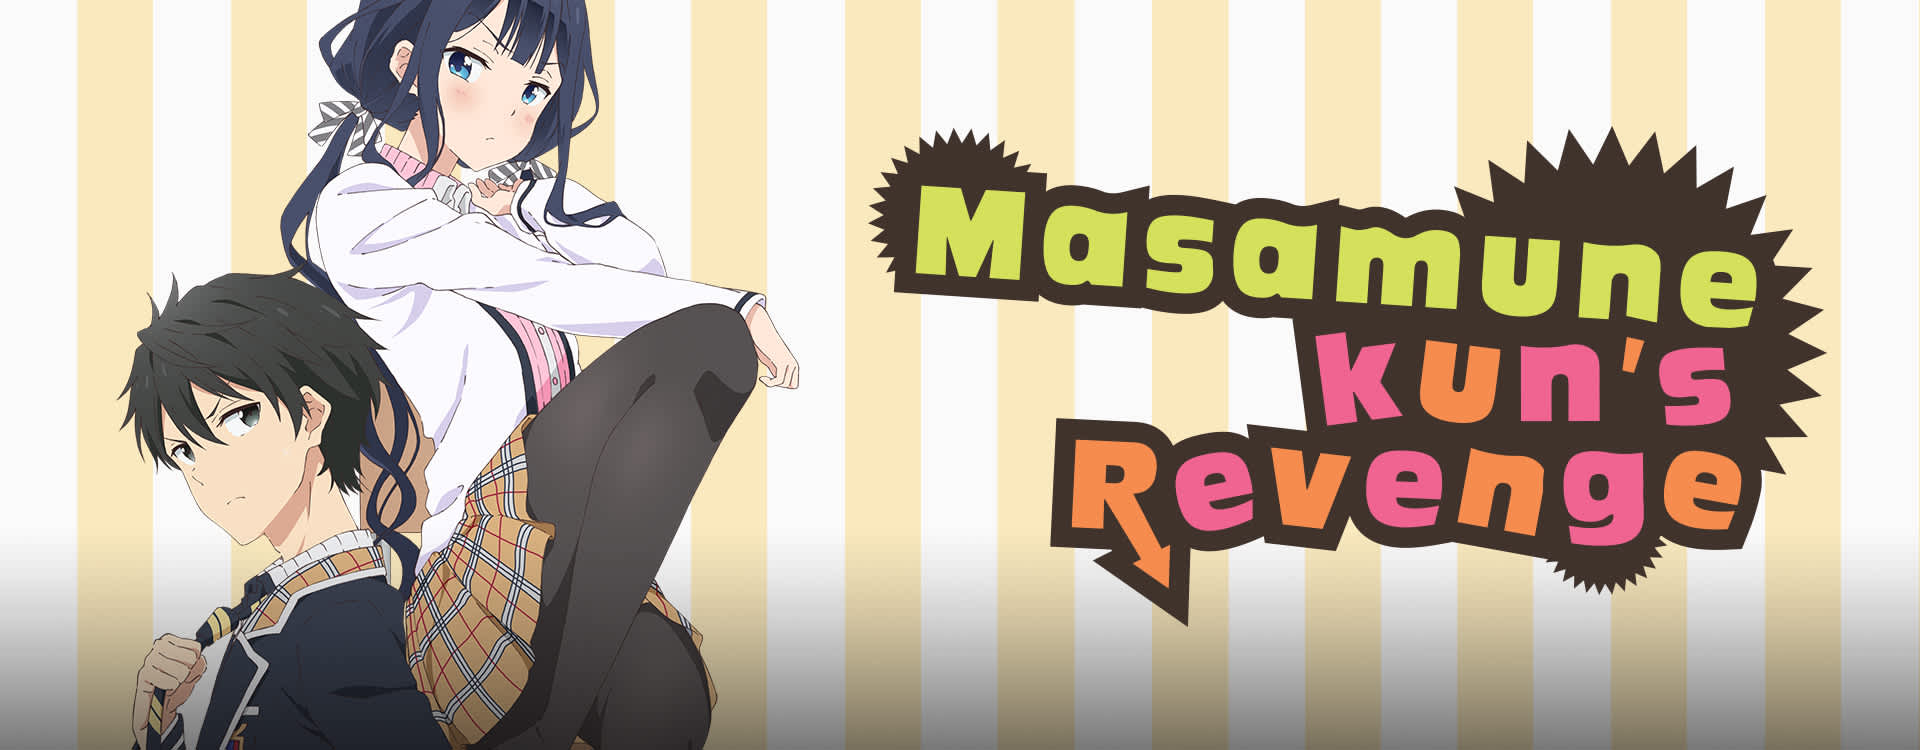 Watch Masamune Kun S Revenge Dub Comedy Romance Anime Funimation Images, Photos, Reviews